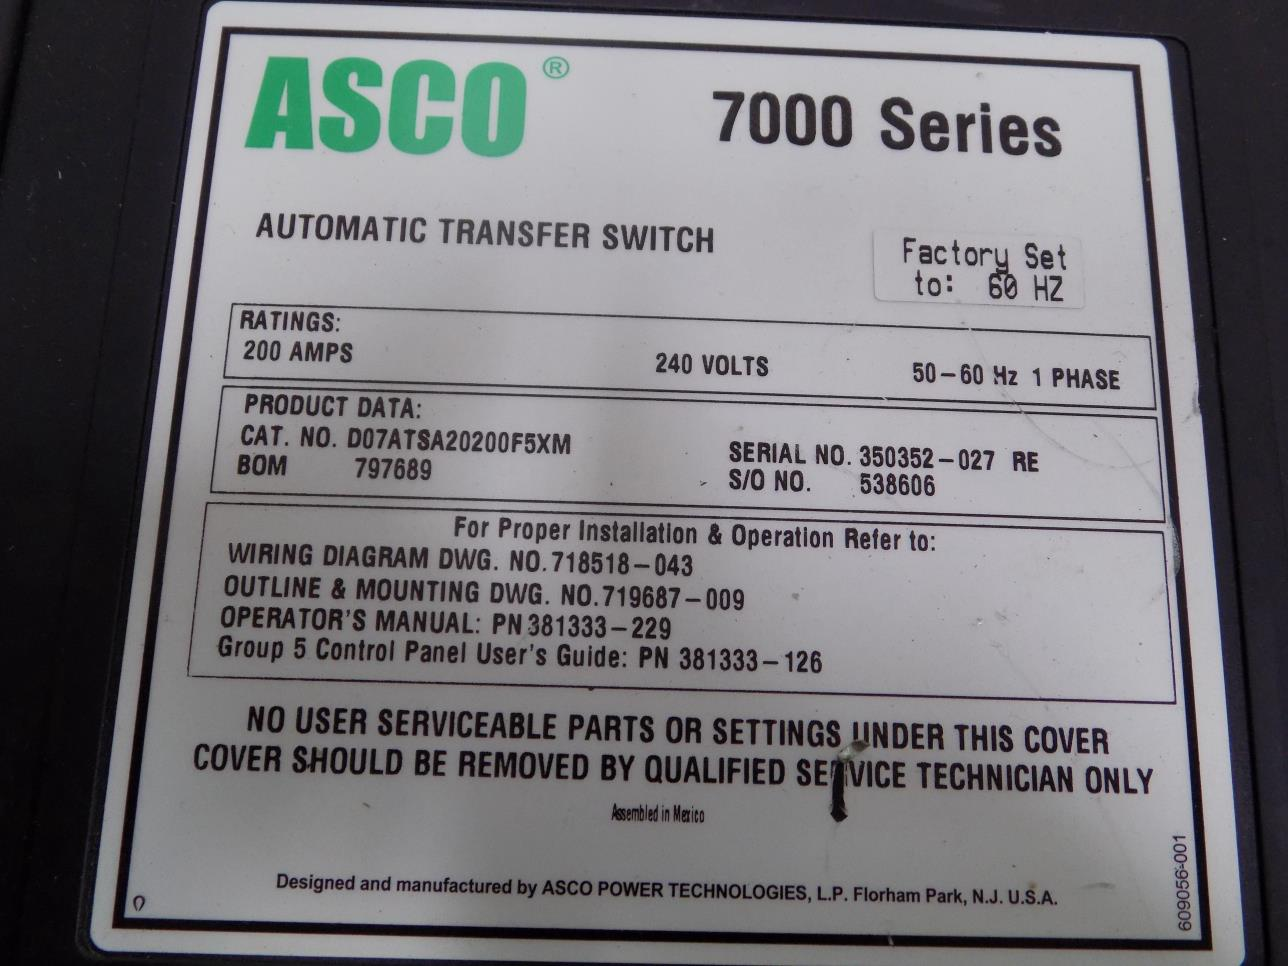 hight resolution of asco 7000 ser 200a 240v 1ph 50 60hz automatic transfer switch d07atsa20200f5xm